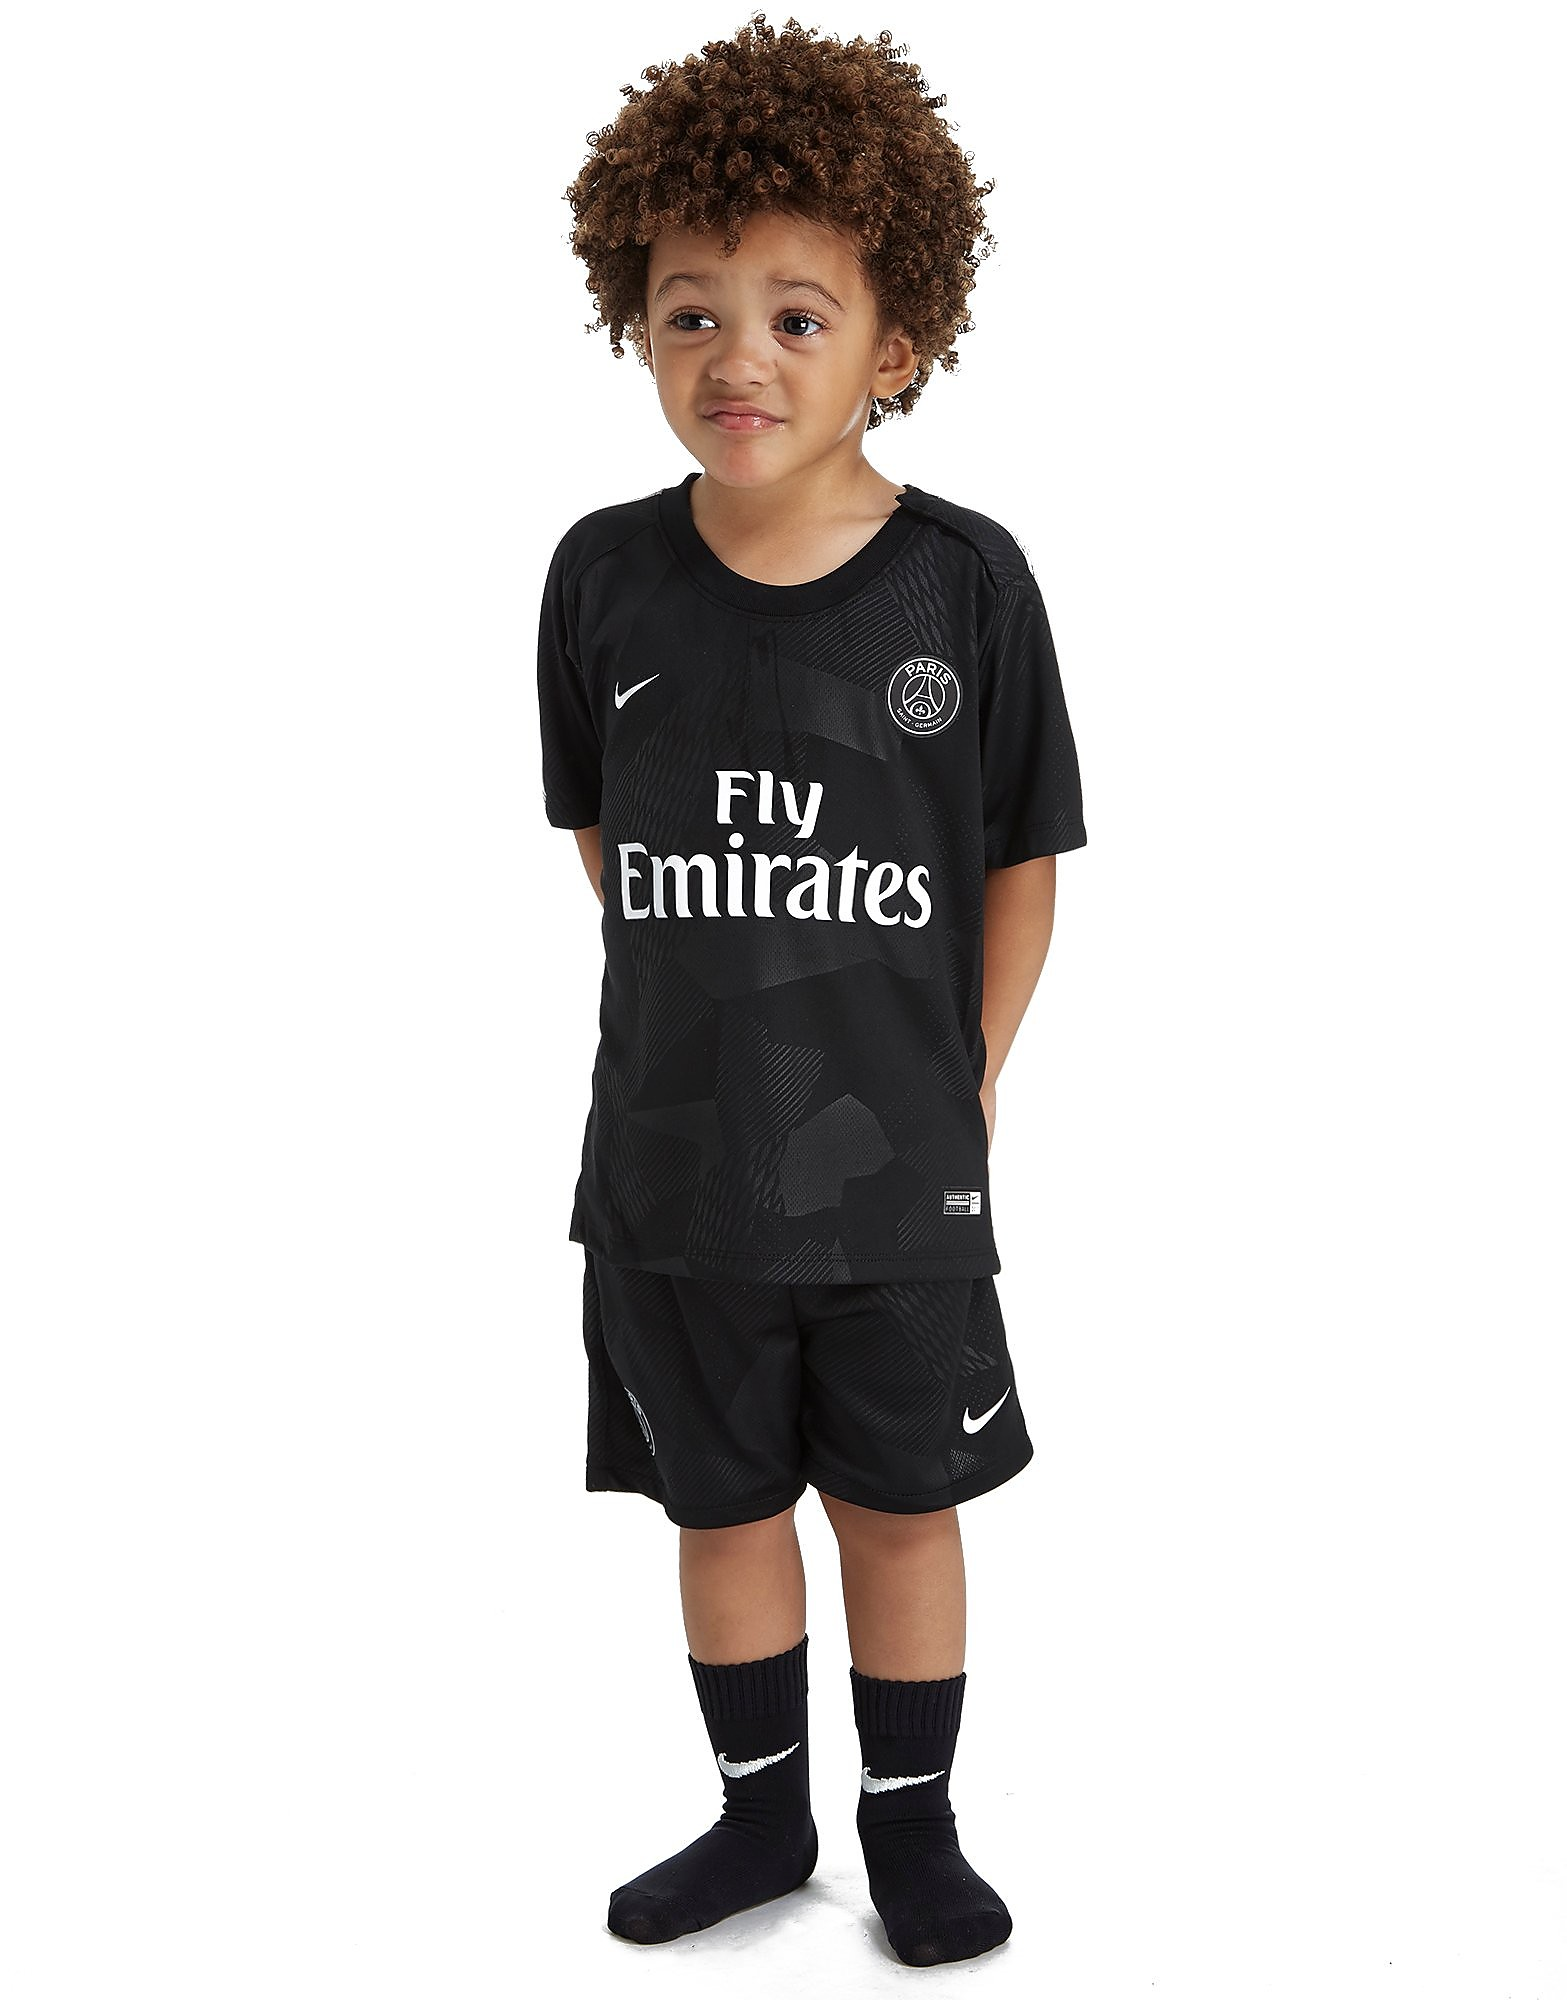 Nike Paris Saint Germain 2017/18 Drittes Kit Kleinkinder